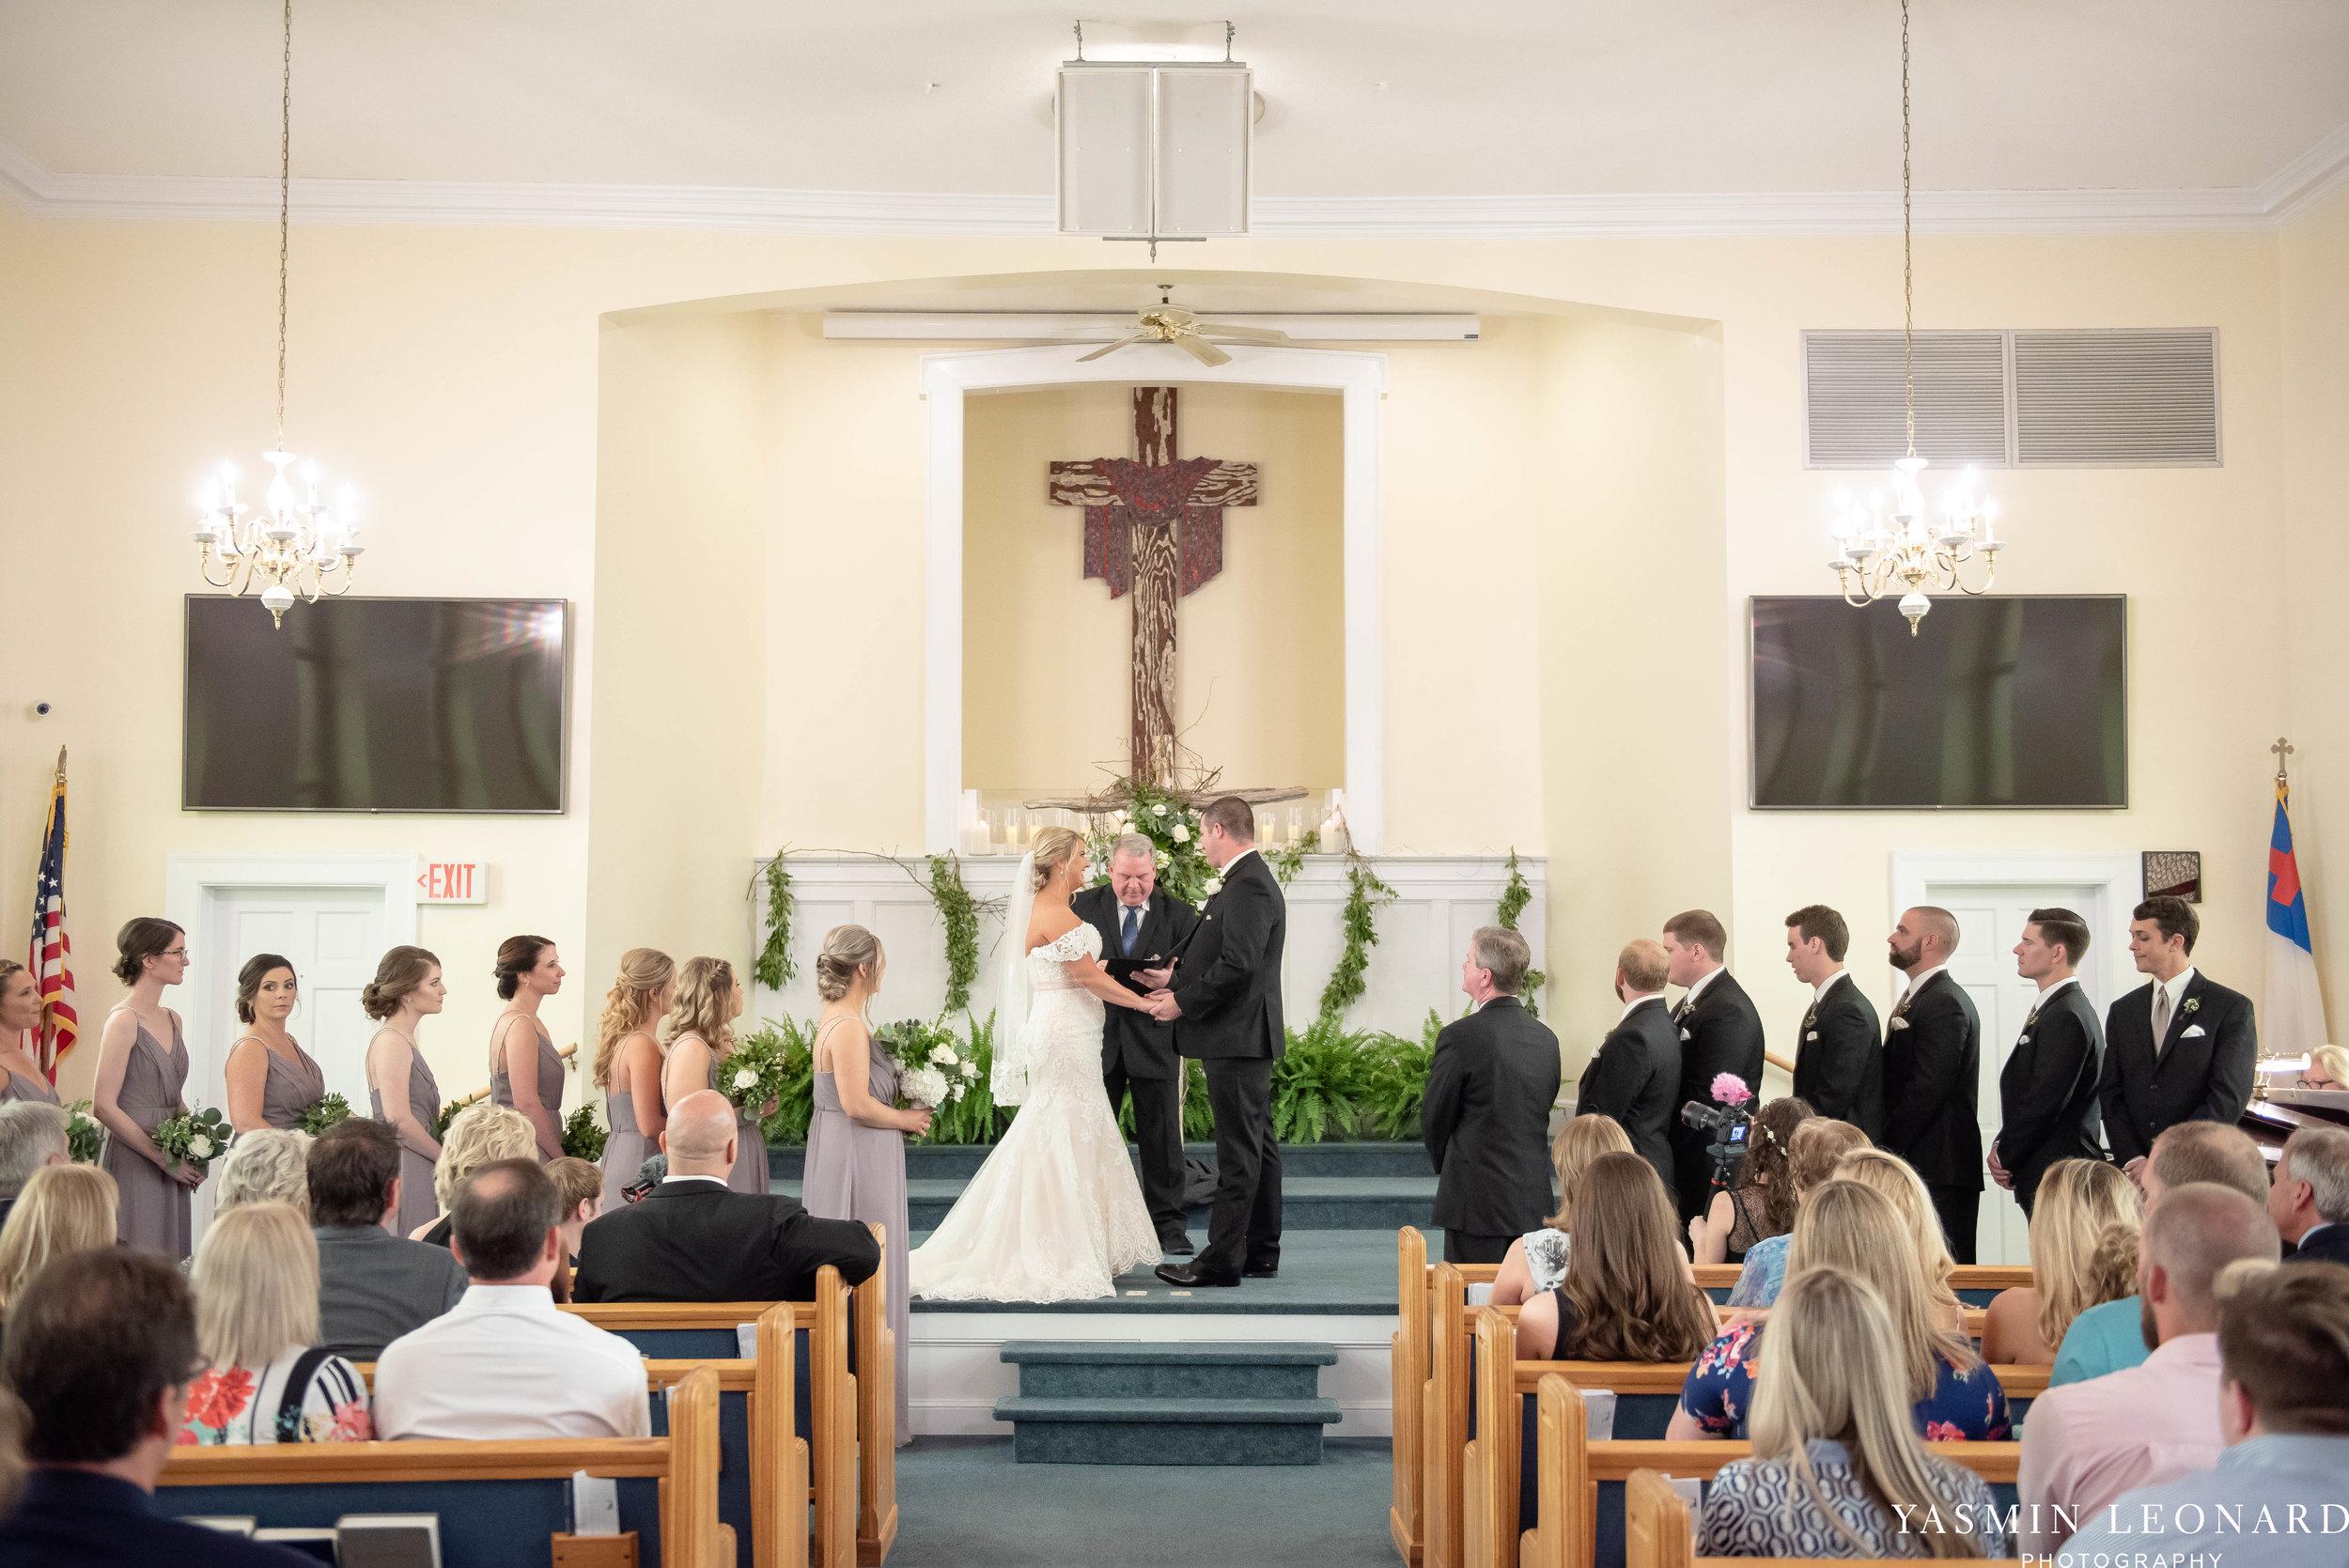 Carolina Beach Wedding - Fort Fisher Wedding - NC Acquarium - Beach Wedding - NC Wedding - Beach Wedding Inspiration - Beach Bride-17.jpg